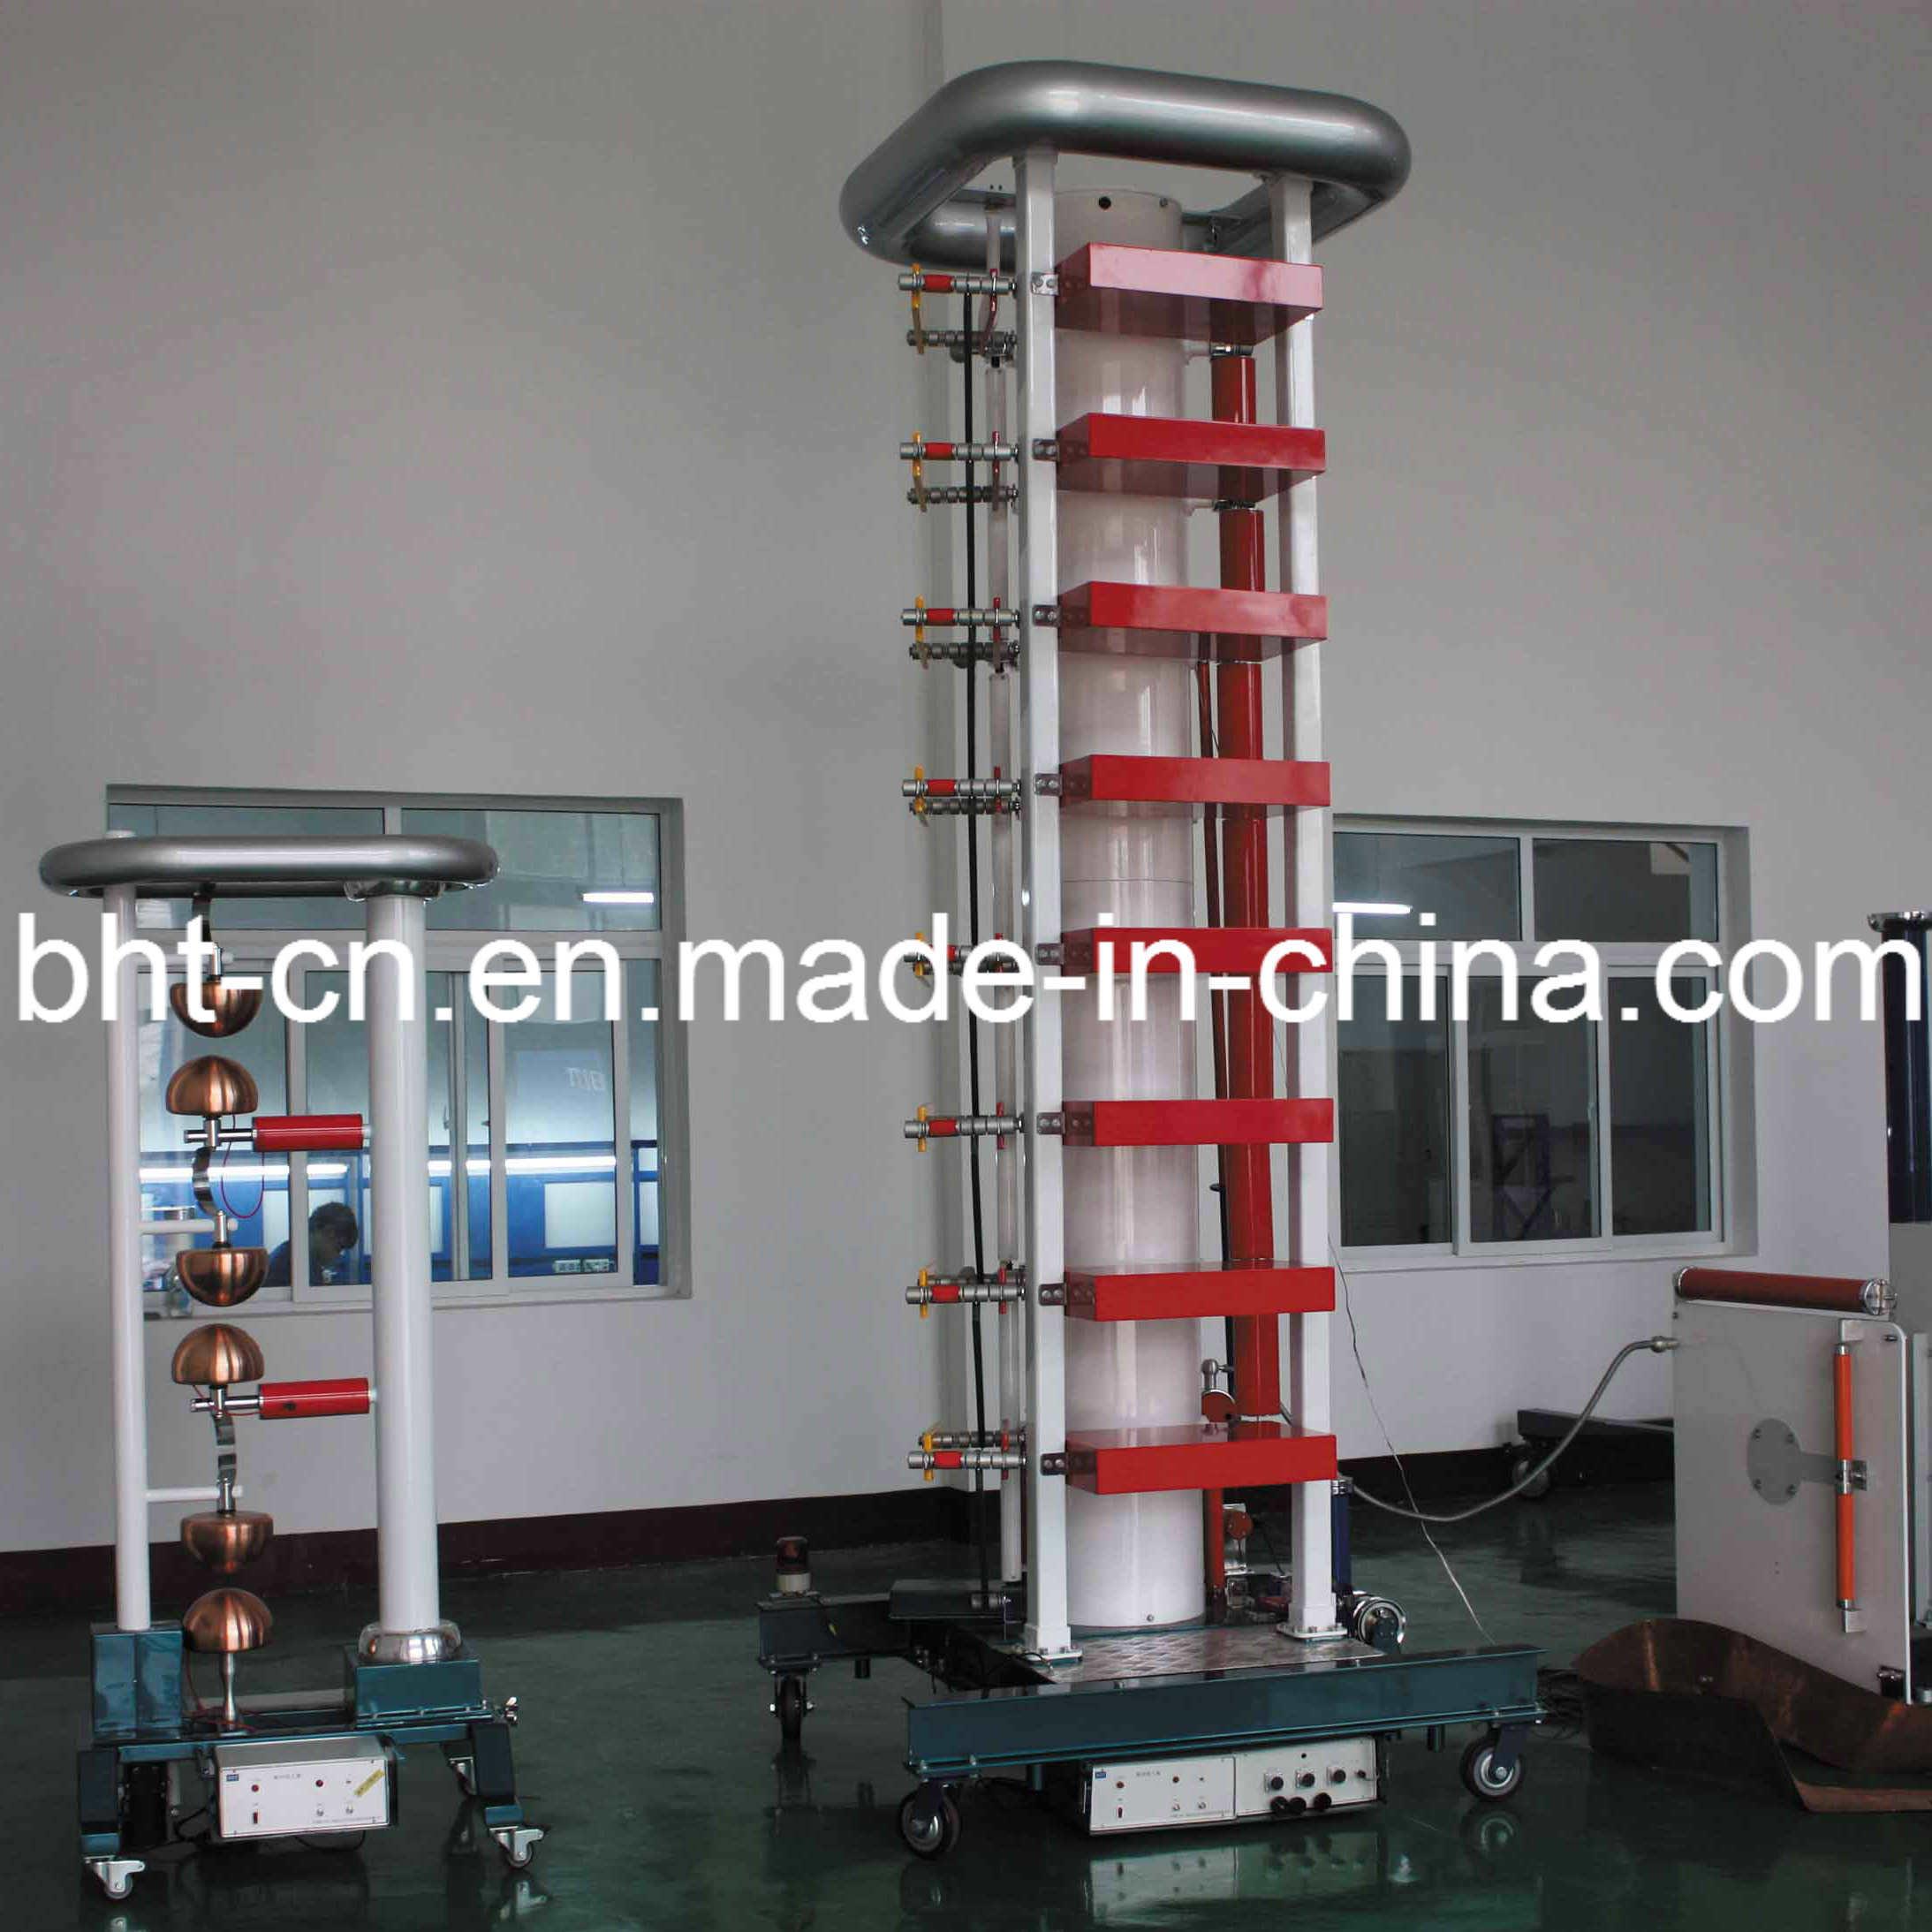 Impulse Voltage Generator (high voltage testing)